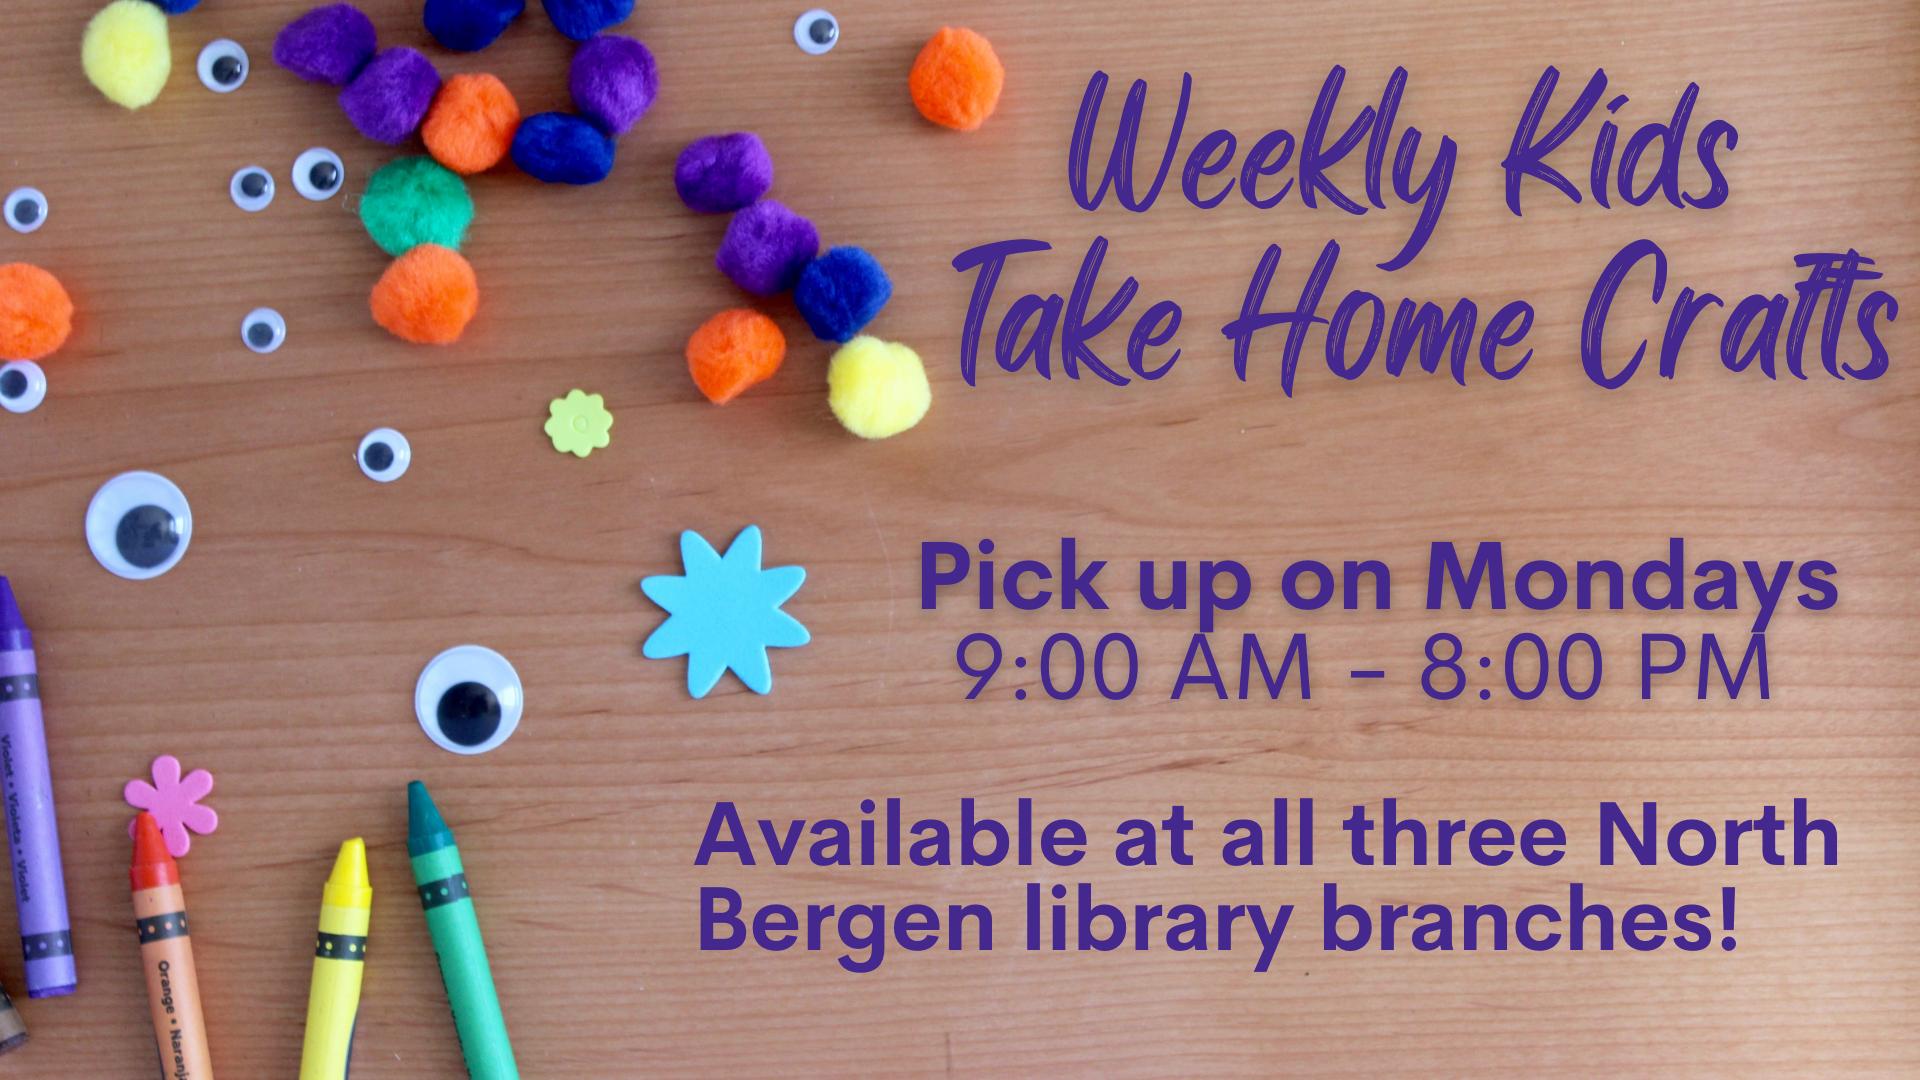 Weekly Kids Take Home Crafts